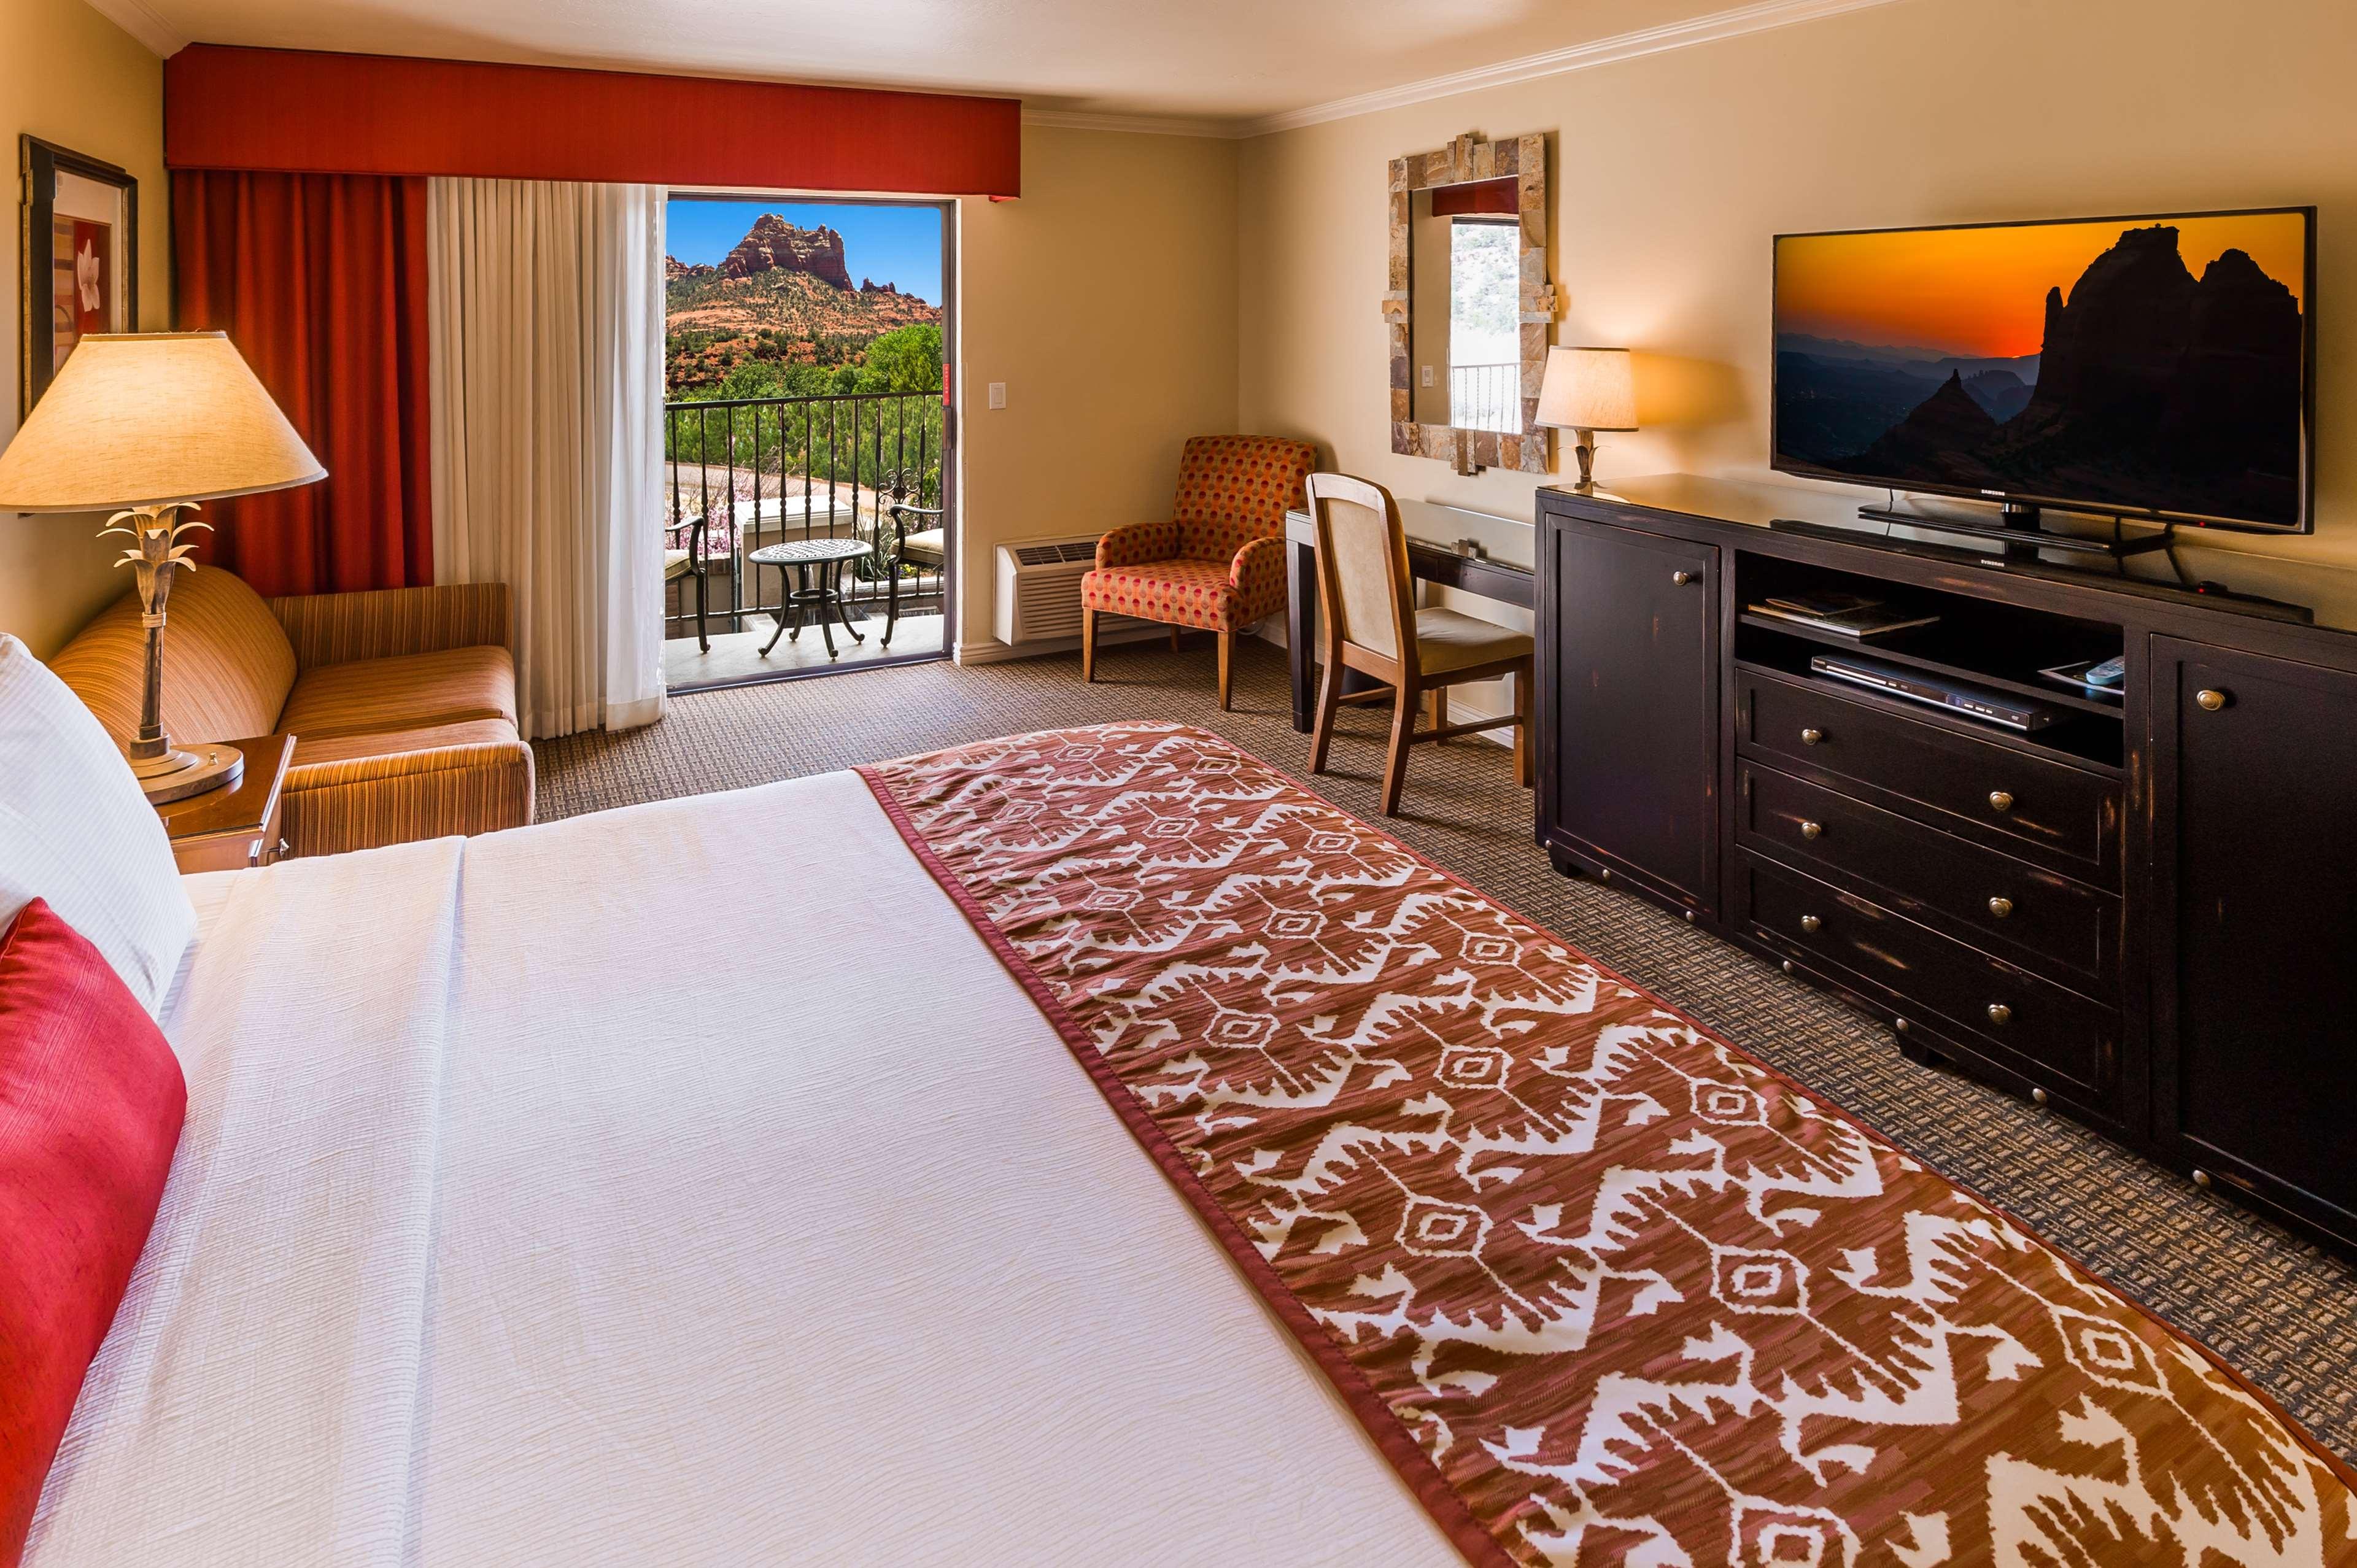 Best Western Plus Arroyo Roble Hotel & Creekside Villas image 5